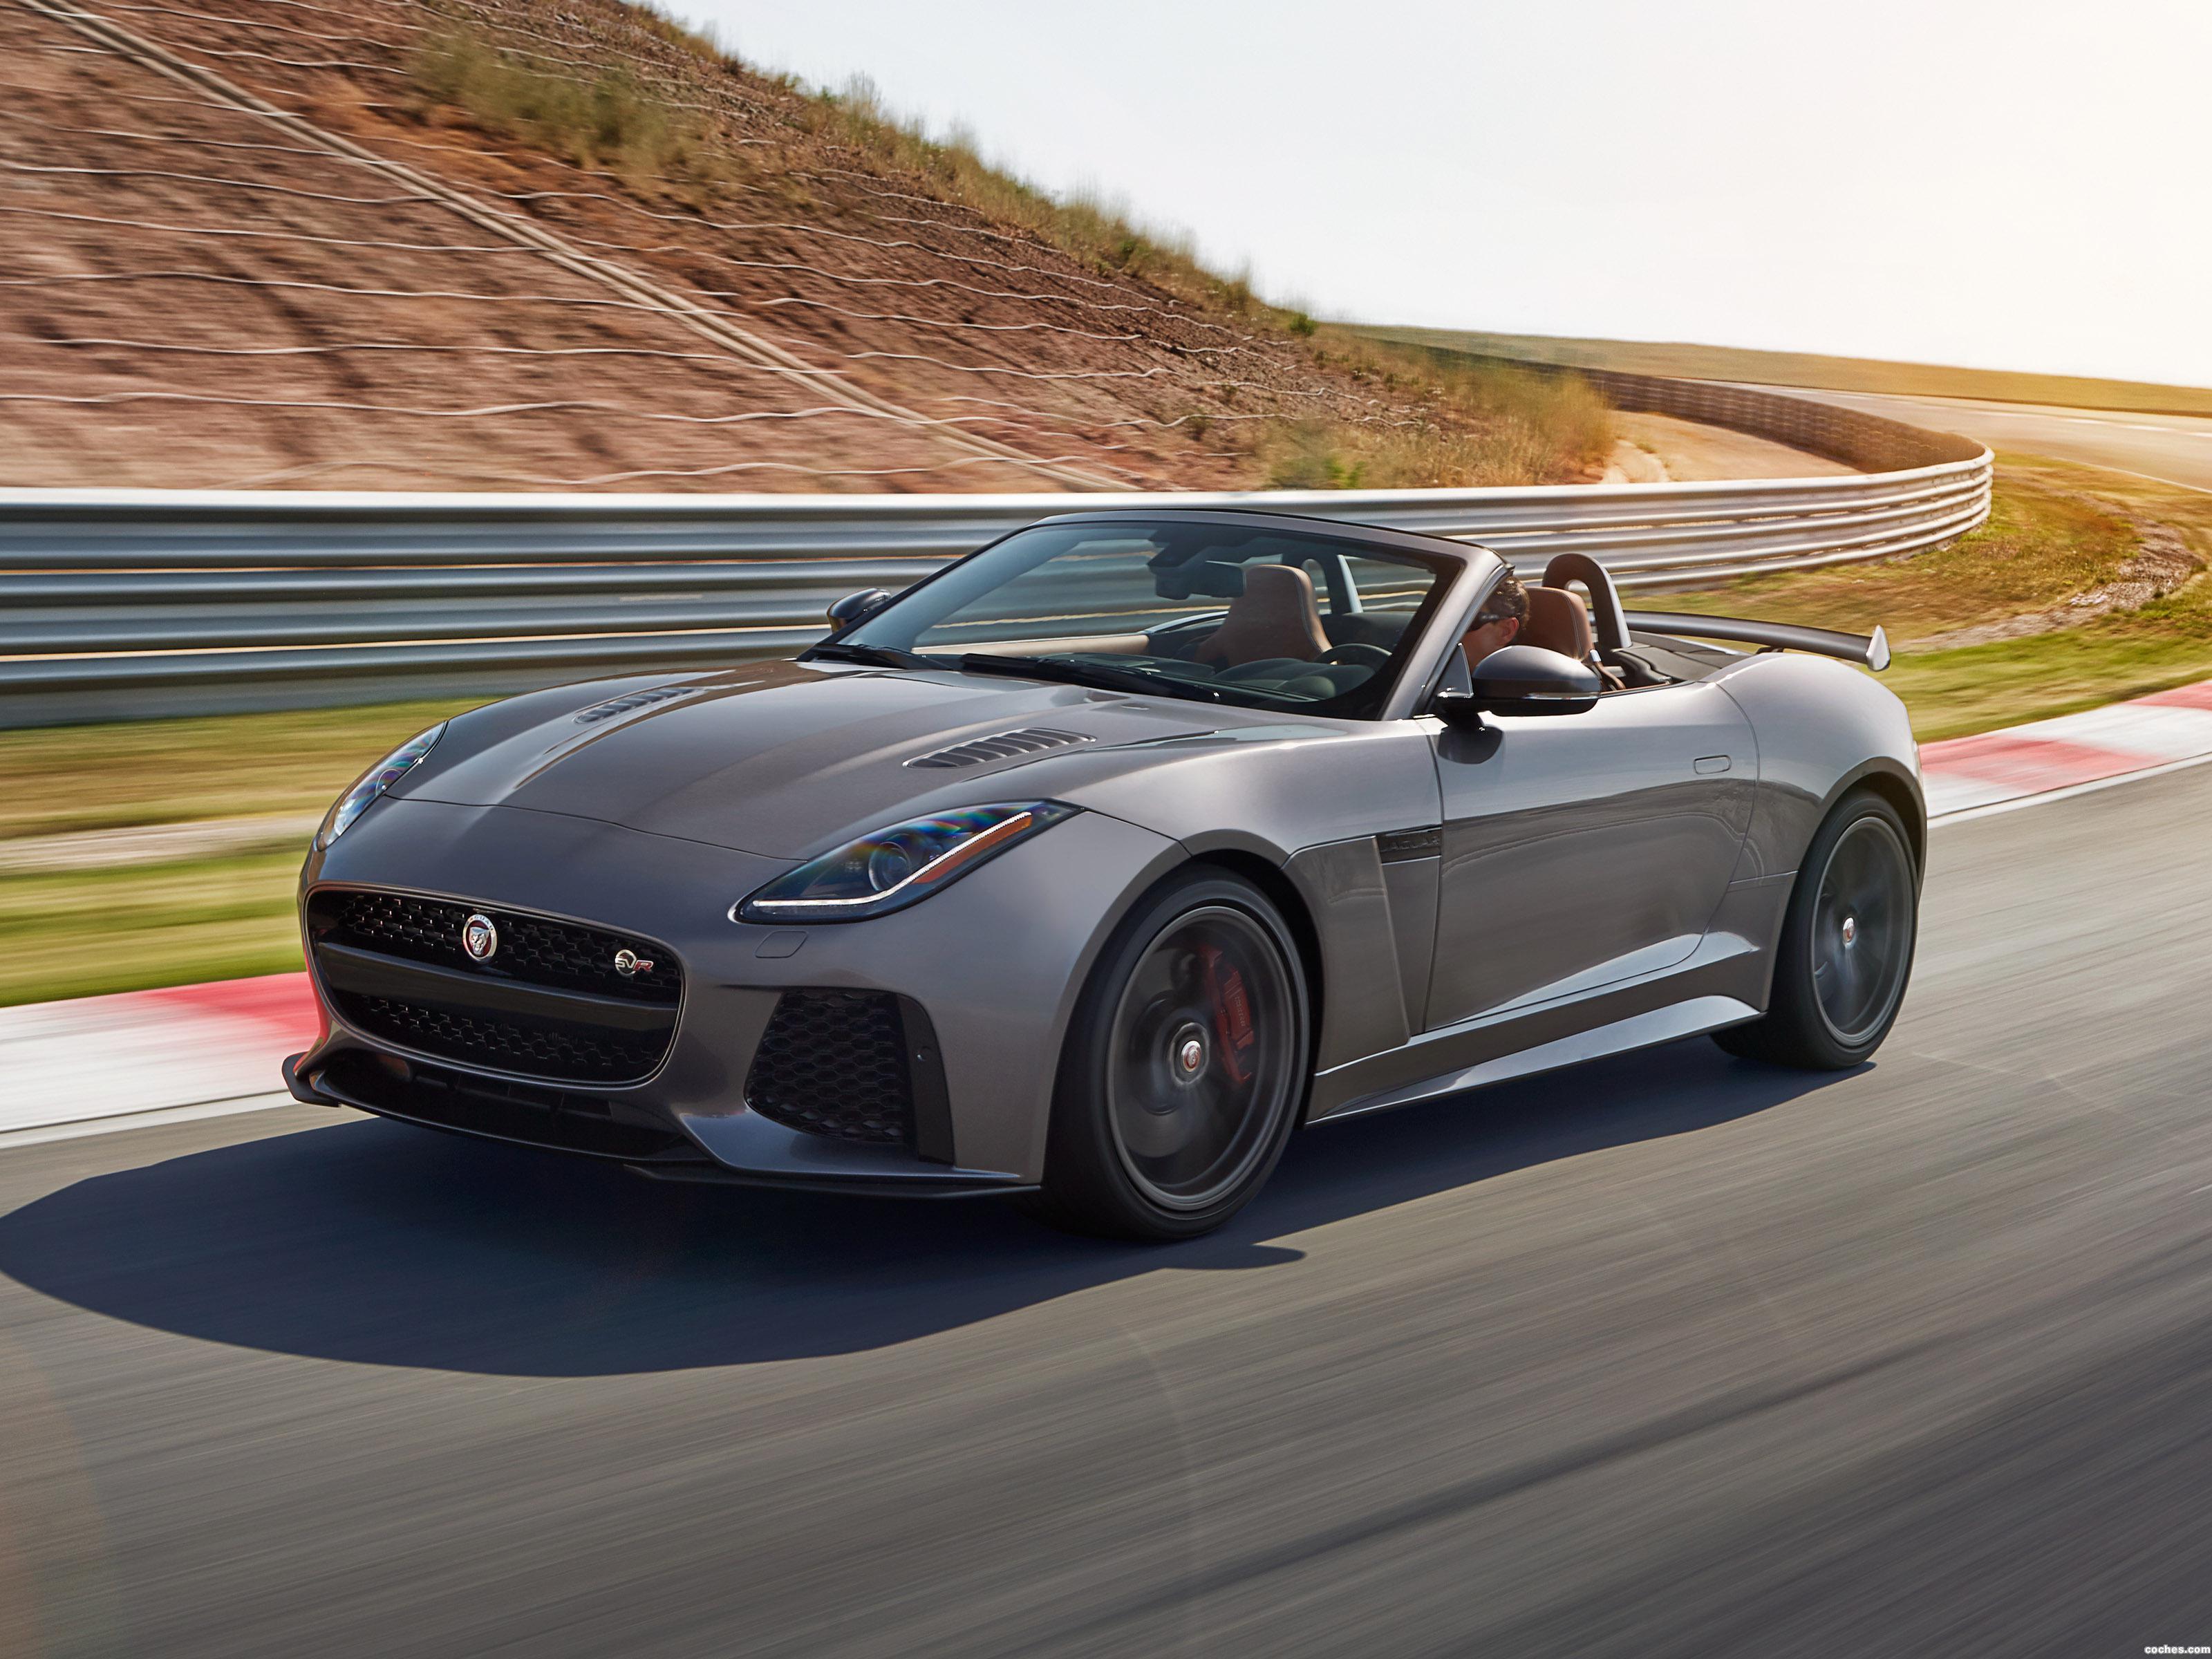 jaguar_f-type-svr-convertible-2016_r17.jpg